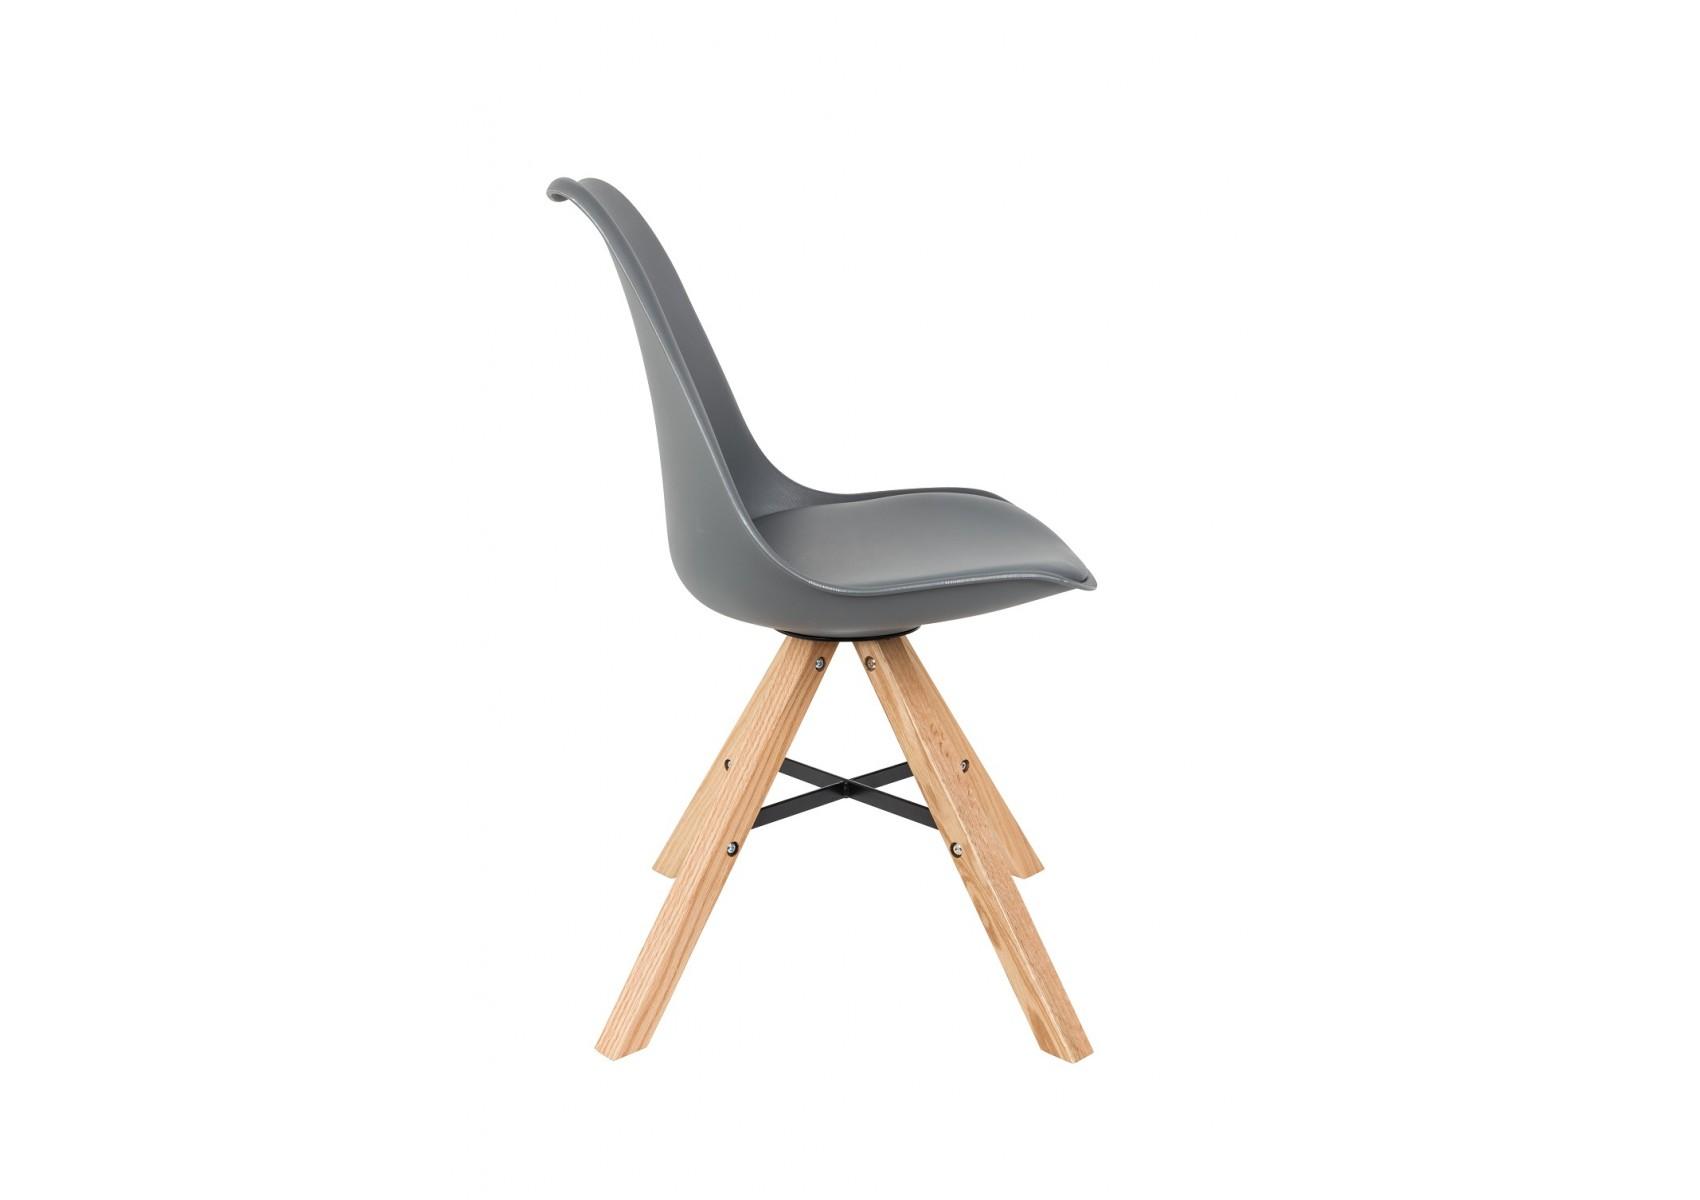 chaise scandinave kell design. Black Bedroom Furniture Sets. Home Design Ideas